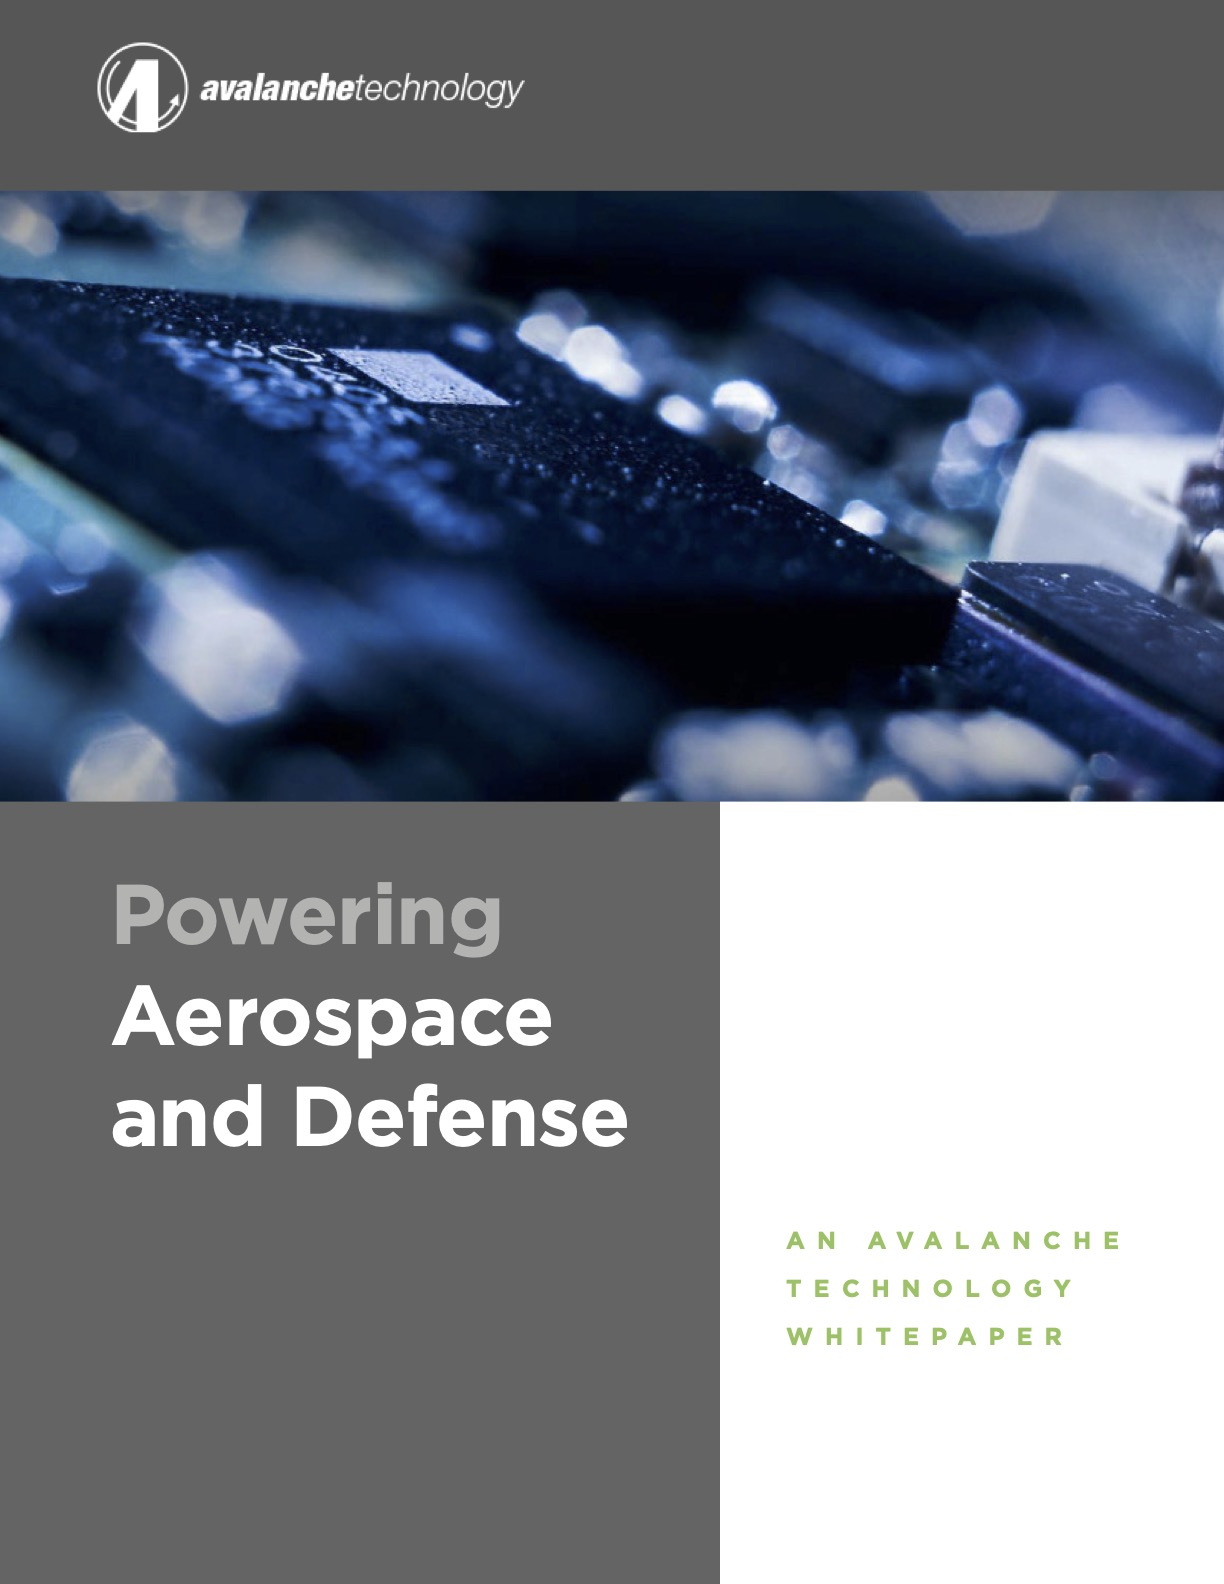 Avalanche Aerospace Whitepaper